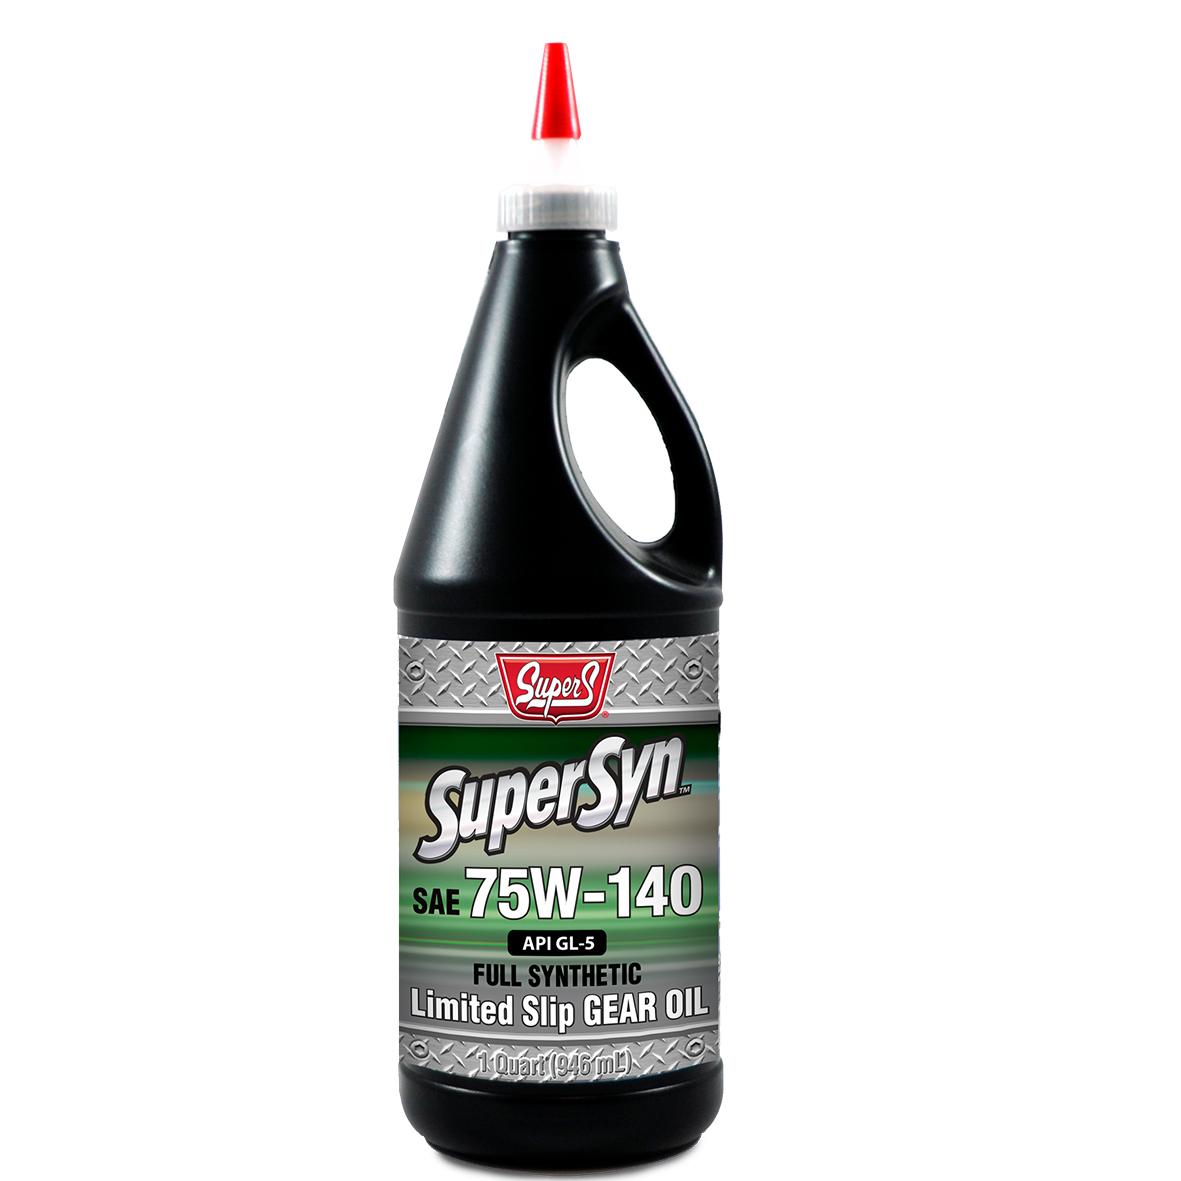 SUPER S SUPERSYN SYNTHETIC 75W-140 LIMITED SLIP GL-5 GEAR OIL